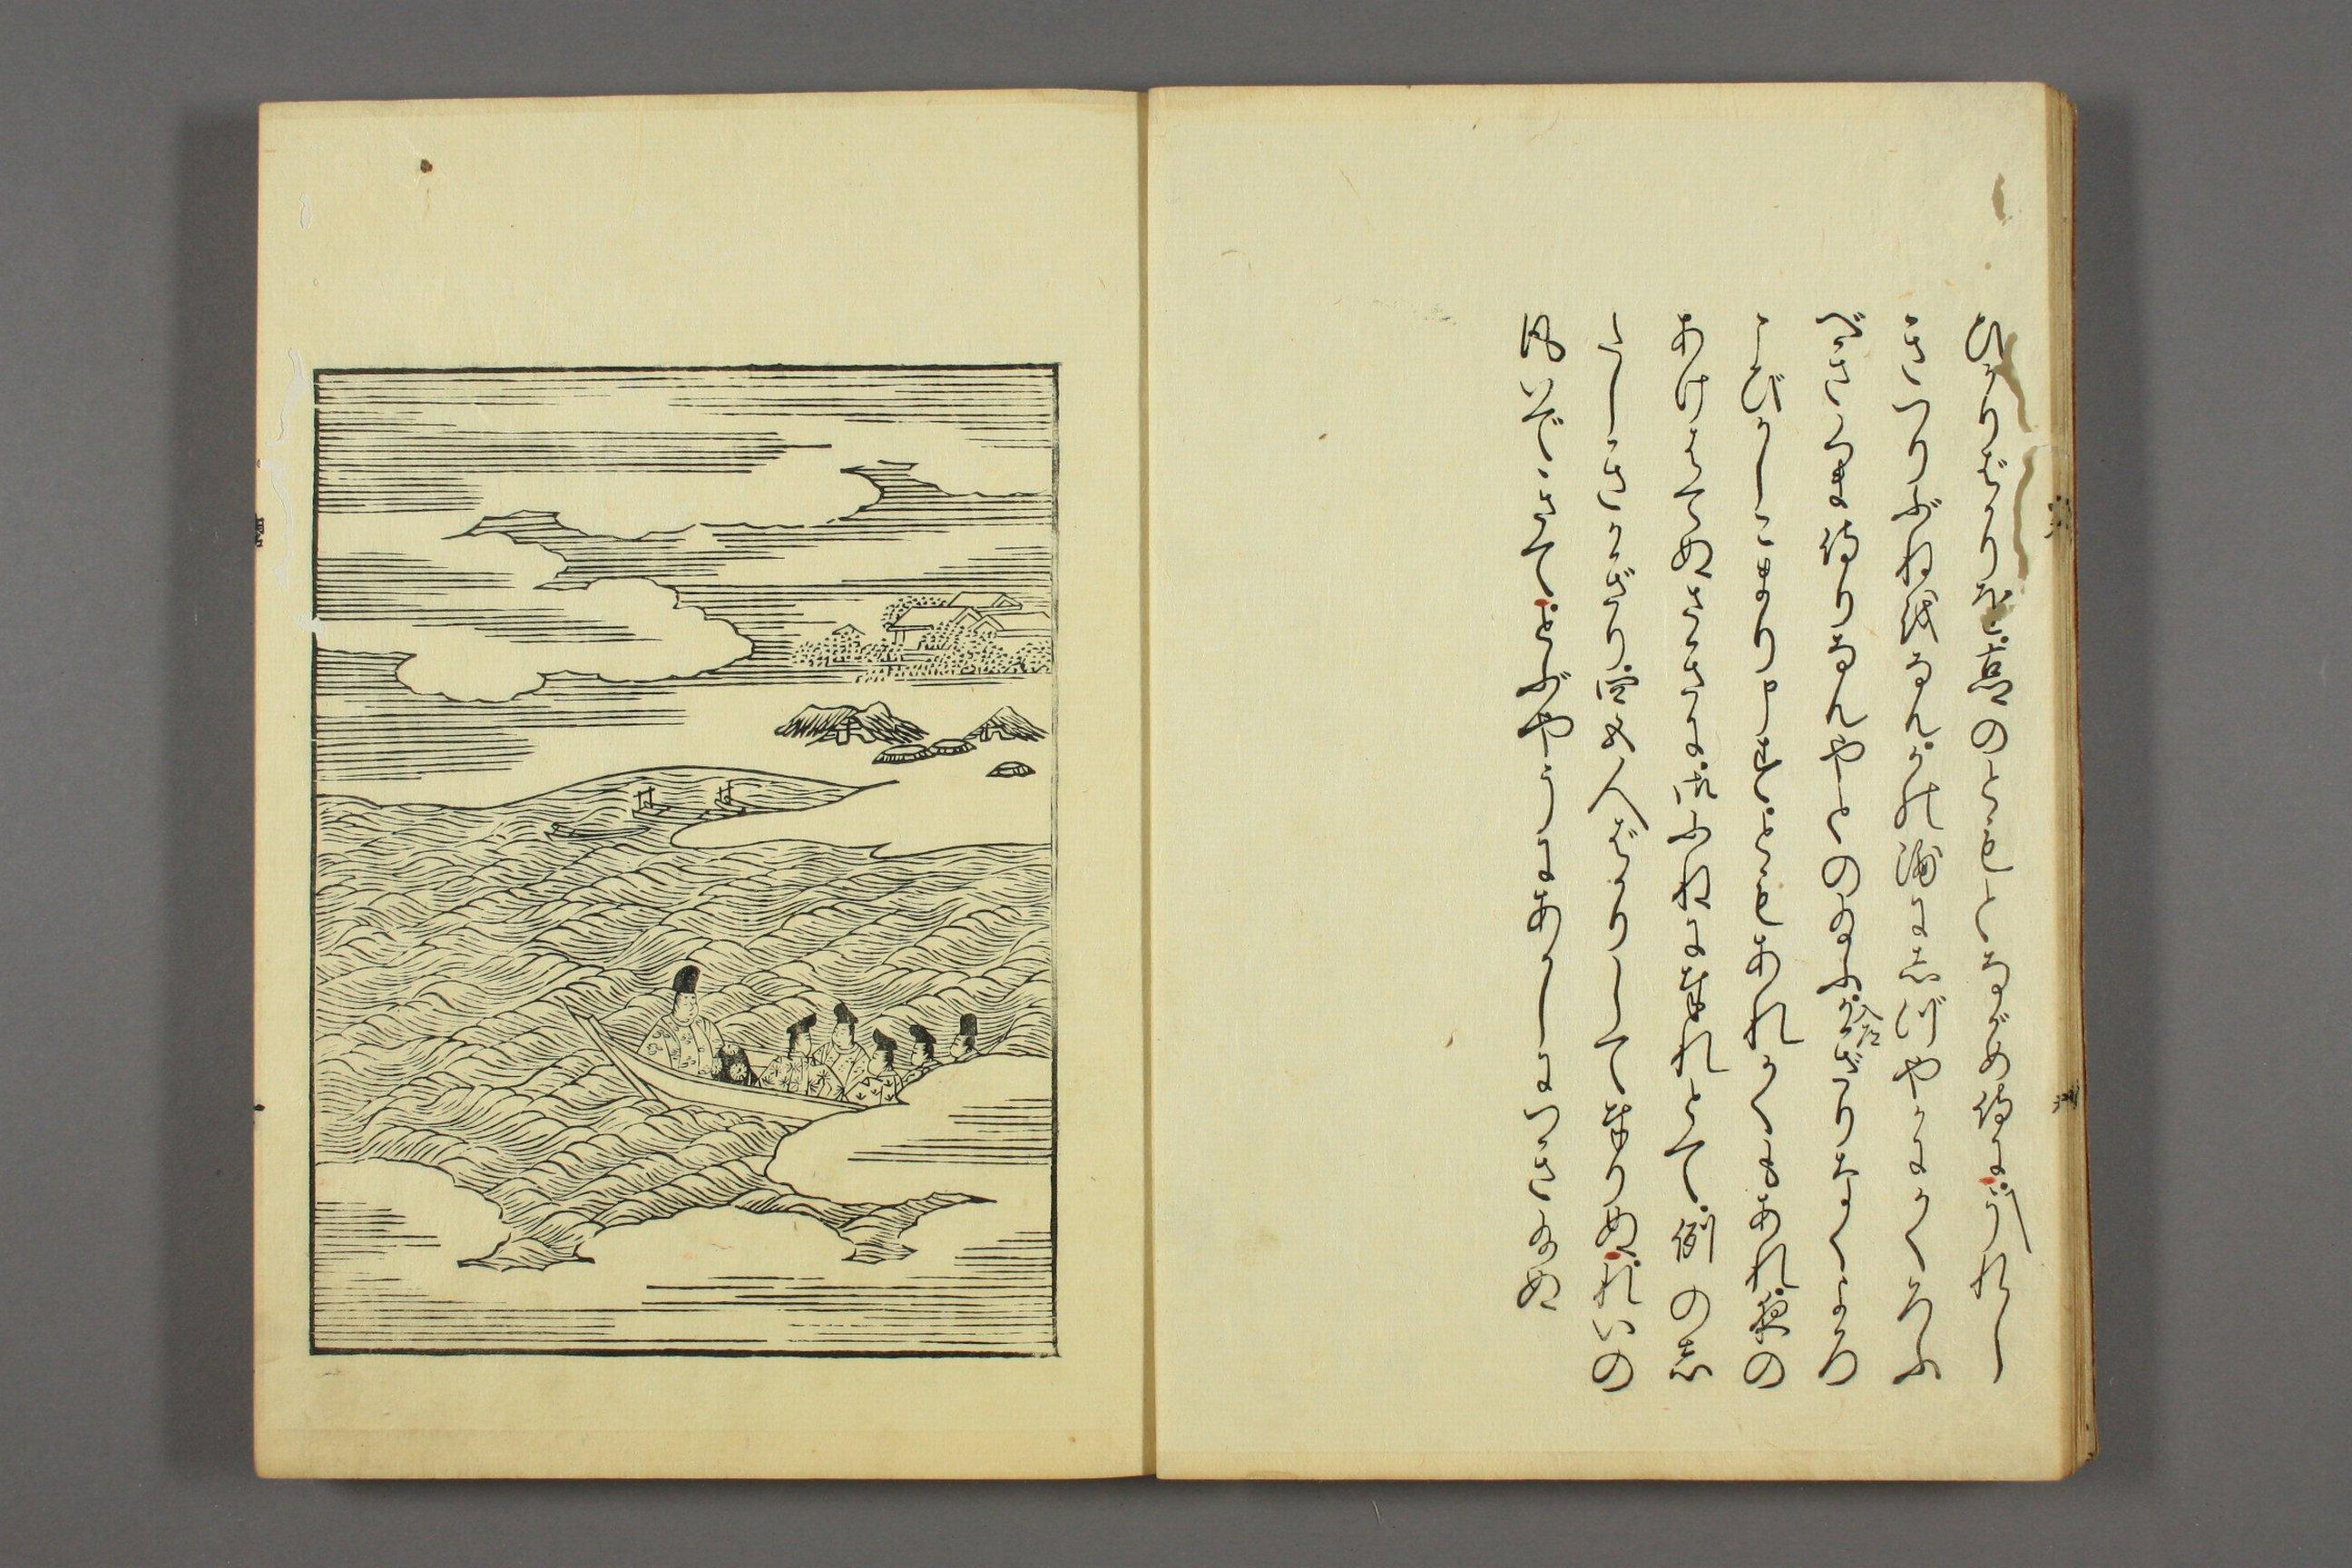 http://archive.wul.waseda.ac.jp/kosho/bunko30/bunko30_a0007/bunko30_a0007_0013/bunko30_a0007_0013_p0011.jpg